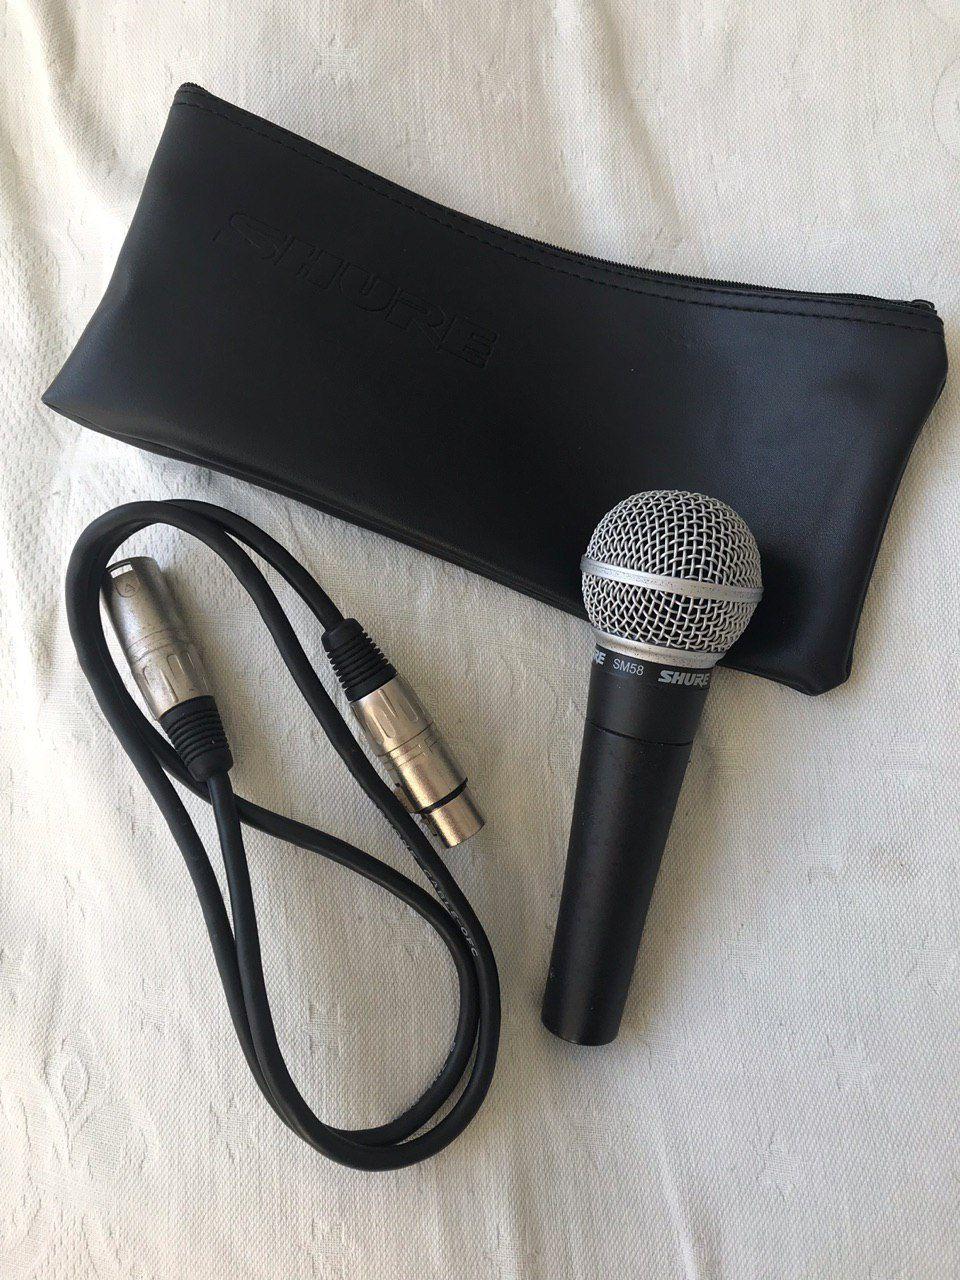 Microfone <usado> classicão Shure SM58 + cabo XLR 1 metro